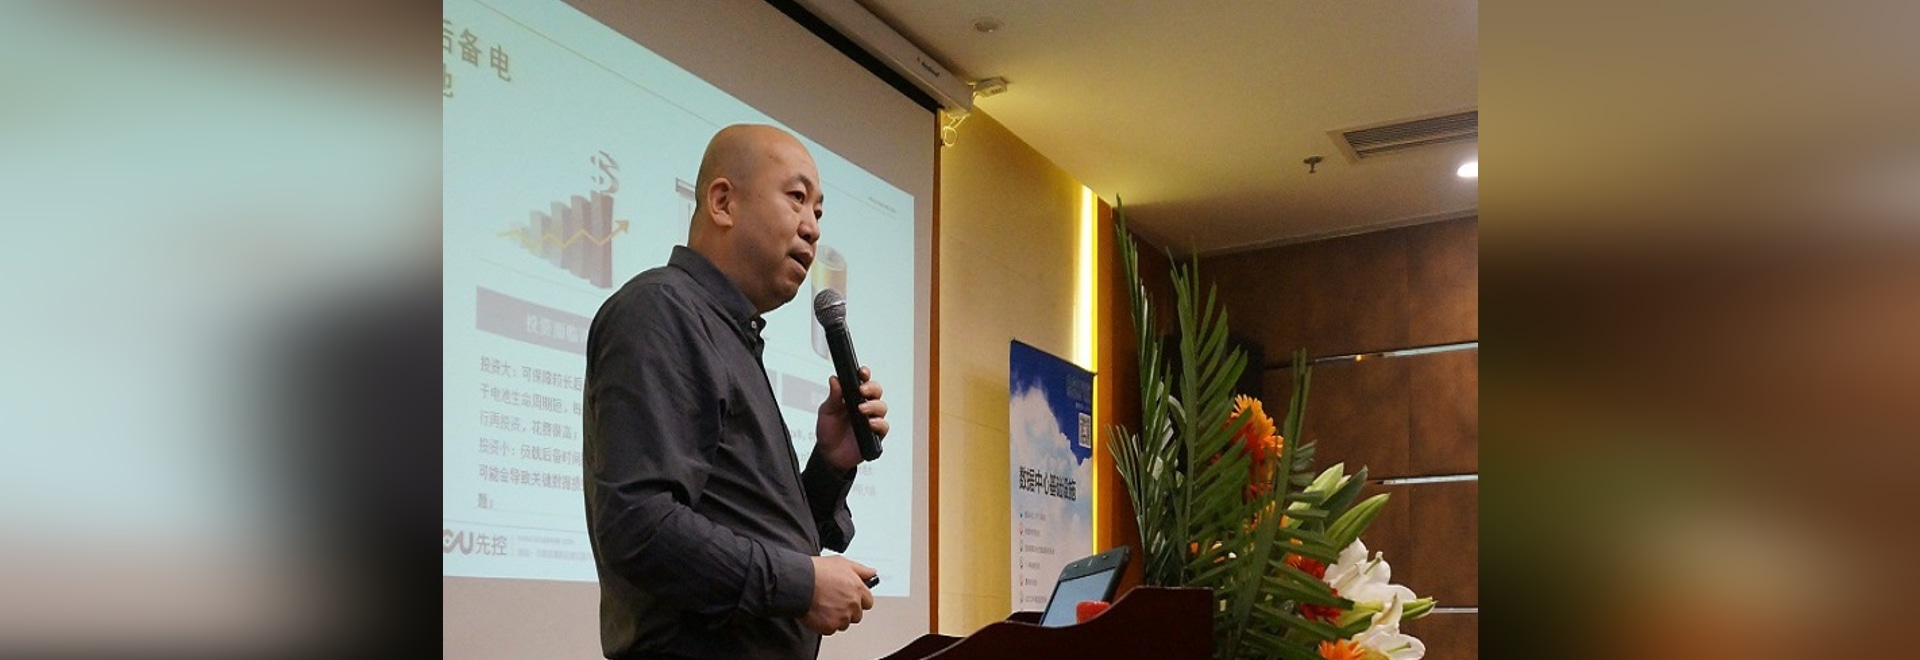 Sicon-Kanal-Partner-Seminar